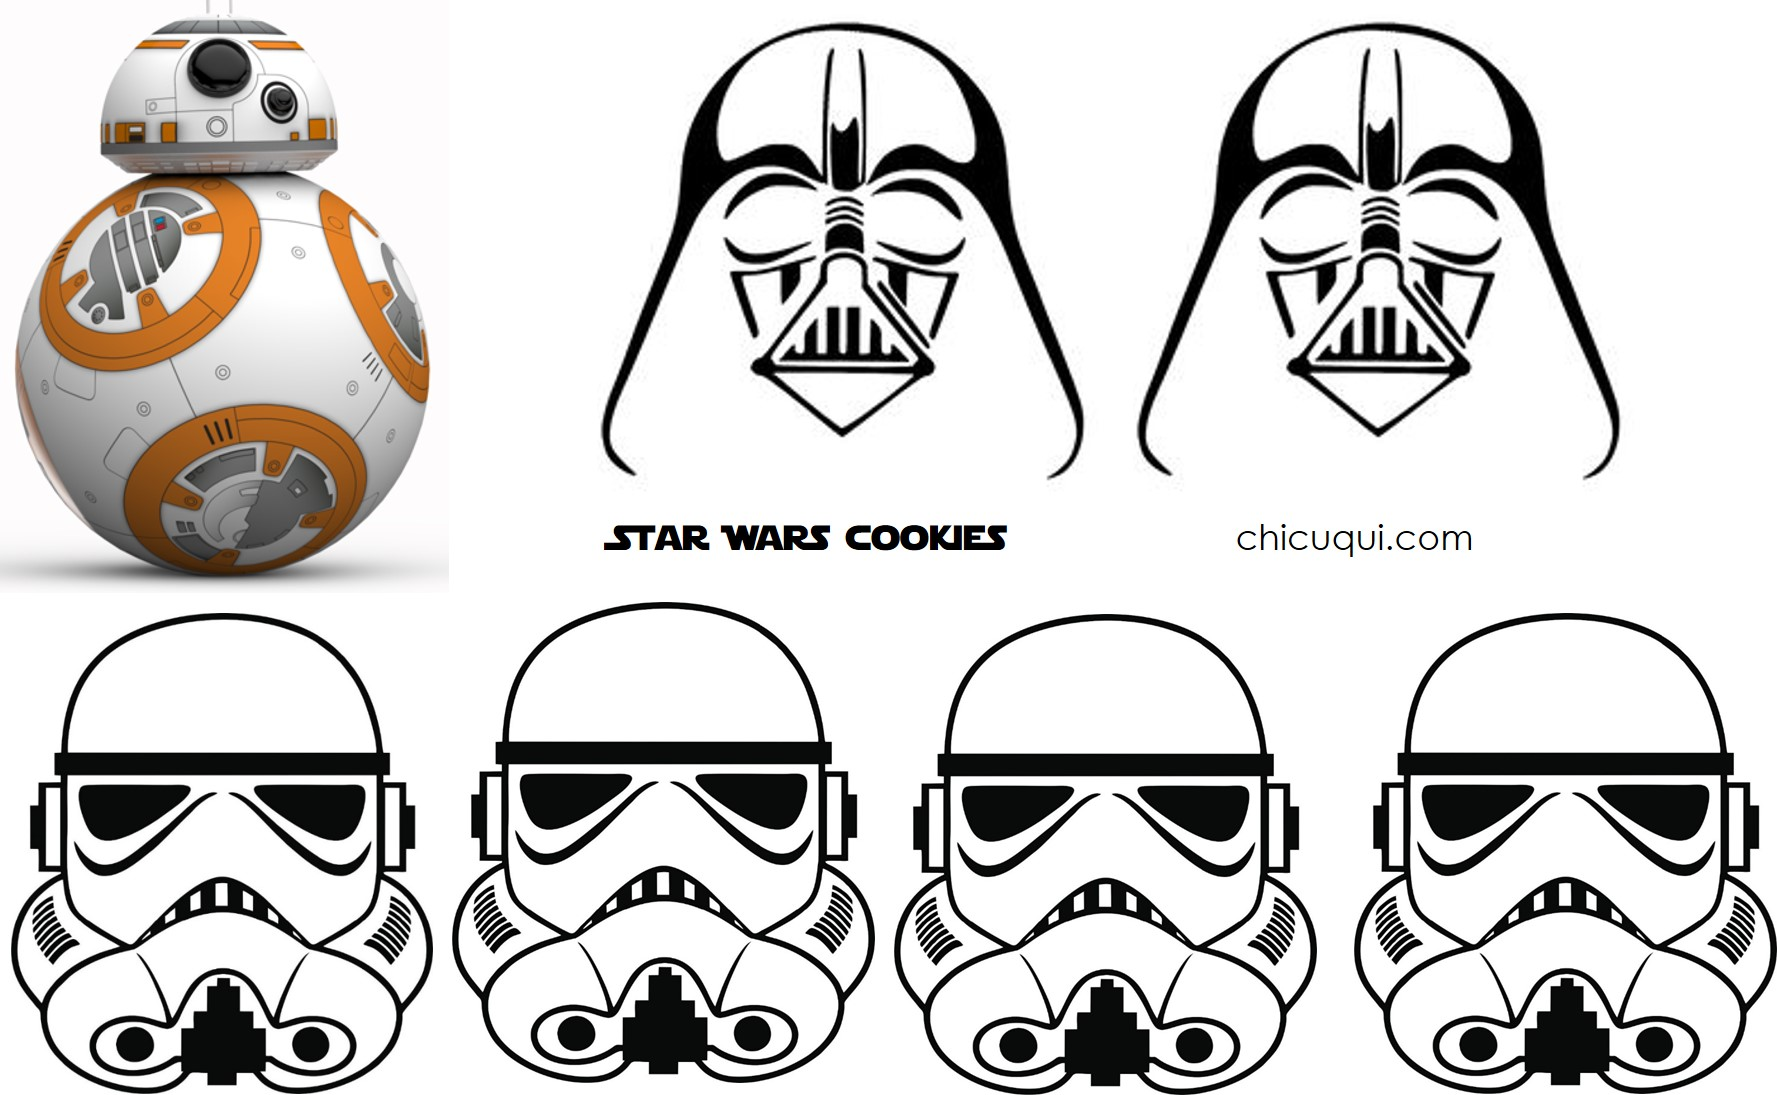 Star Wars cookies | chicuqui